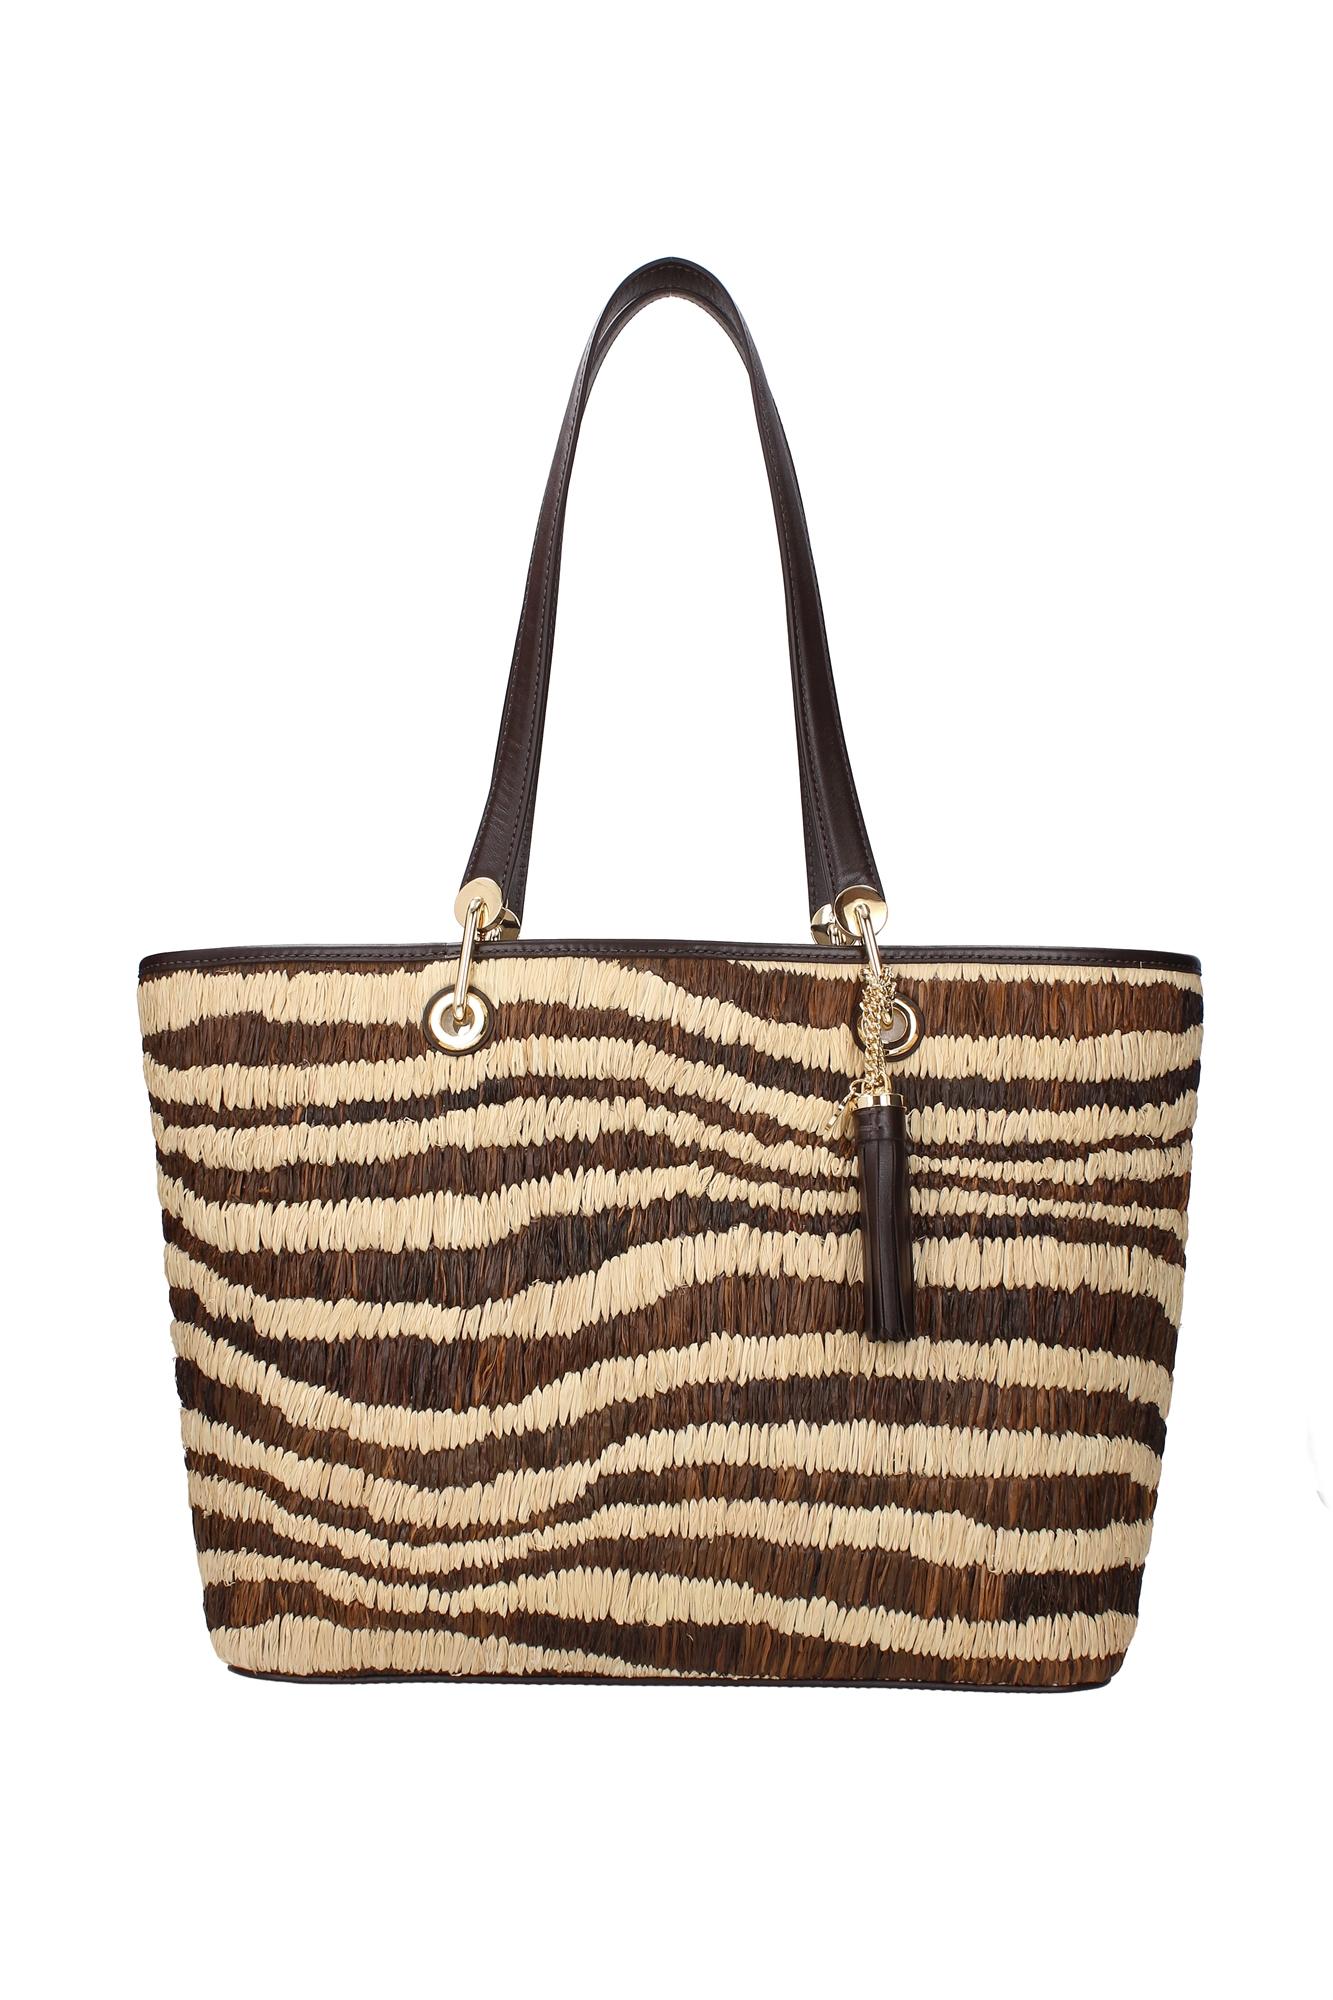 Borse Shopping Michael Kors Donna Rafia Beige 30s7gmbt7wnatural - michael kors - ebay.it